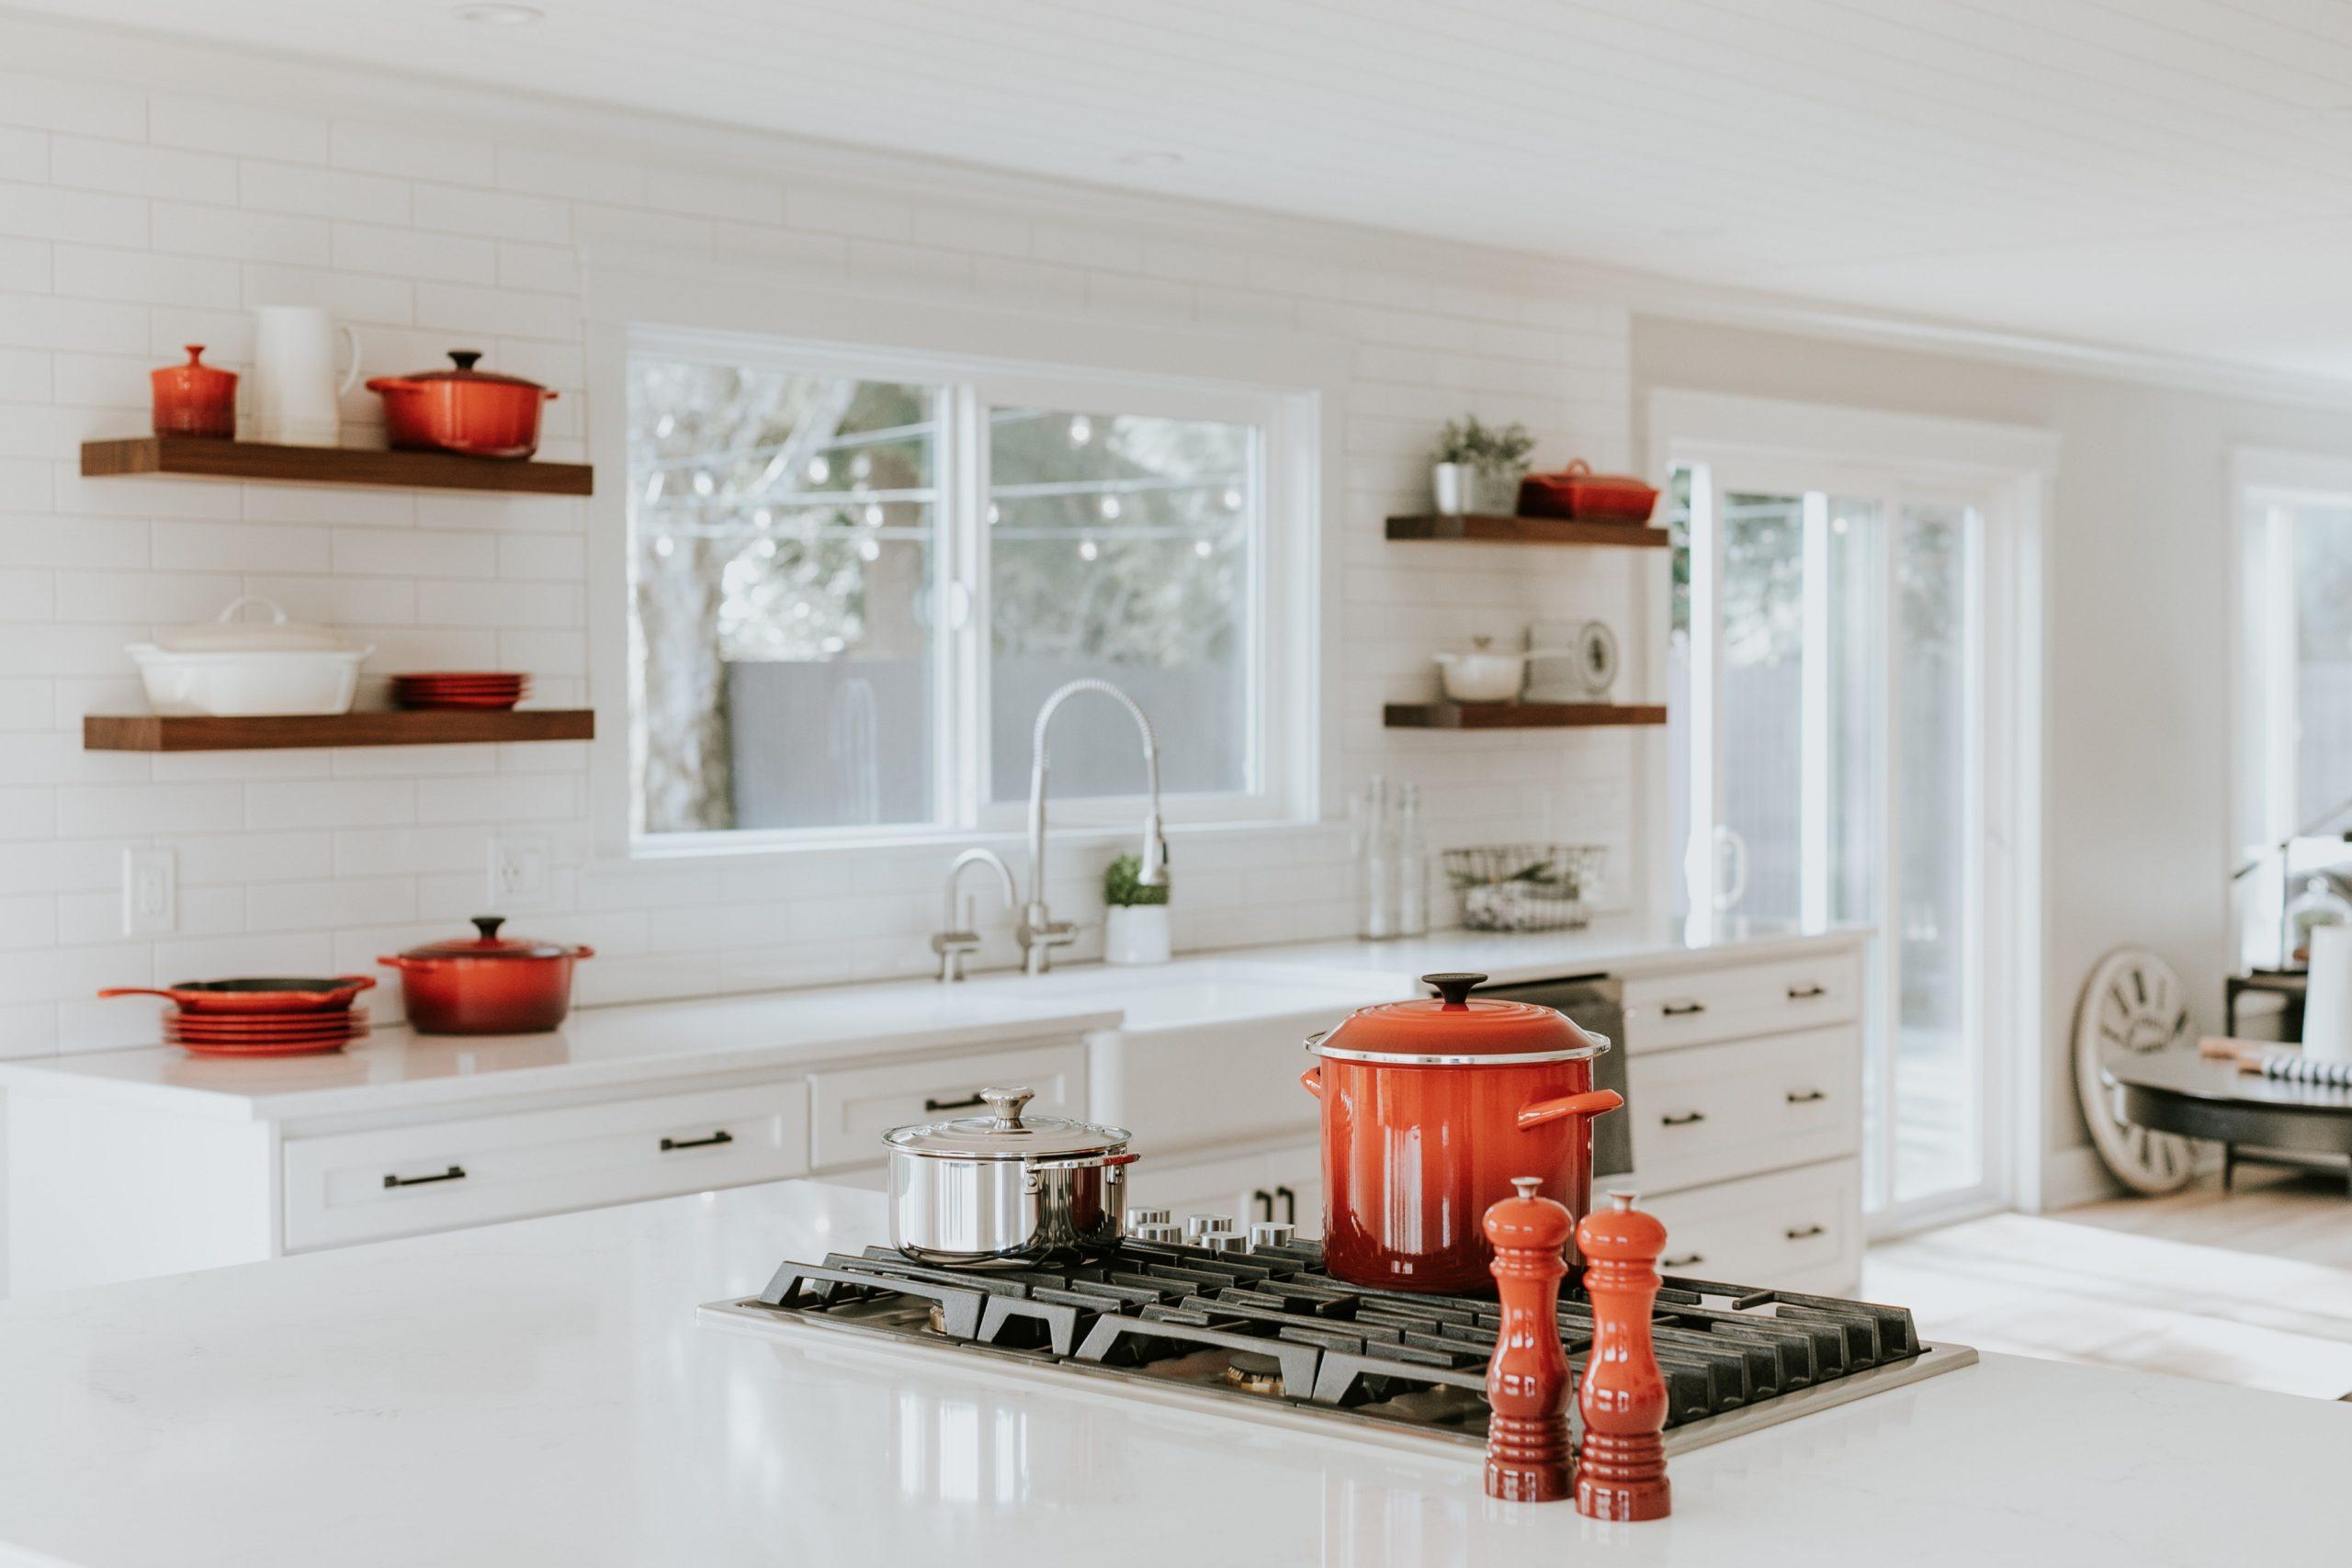 kitchen wallpaper images